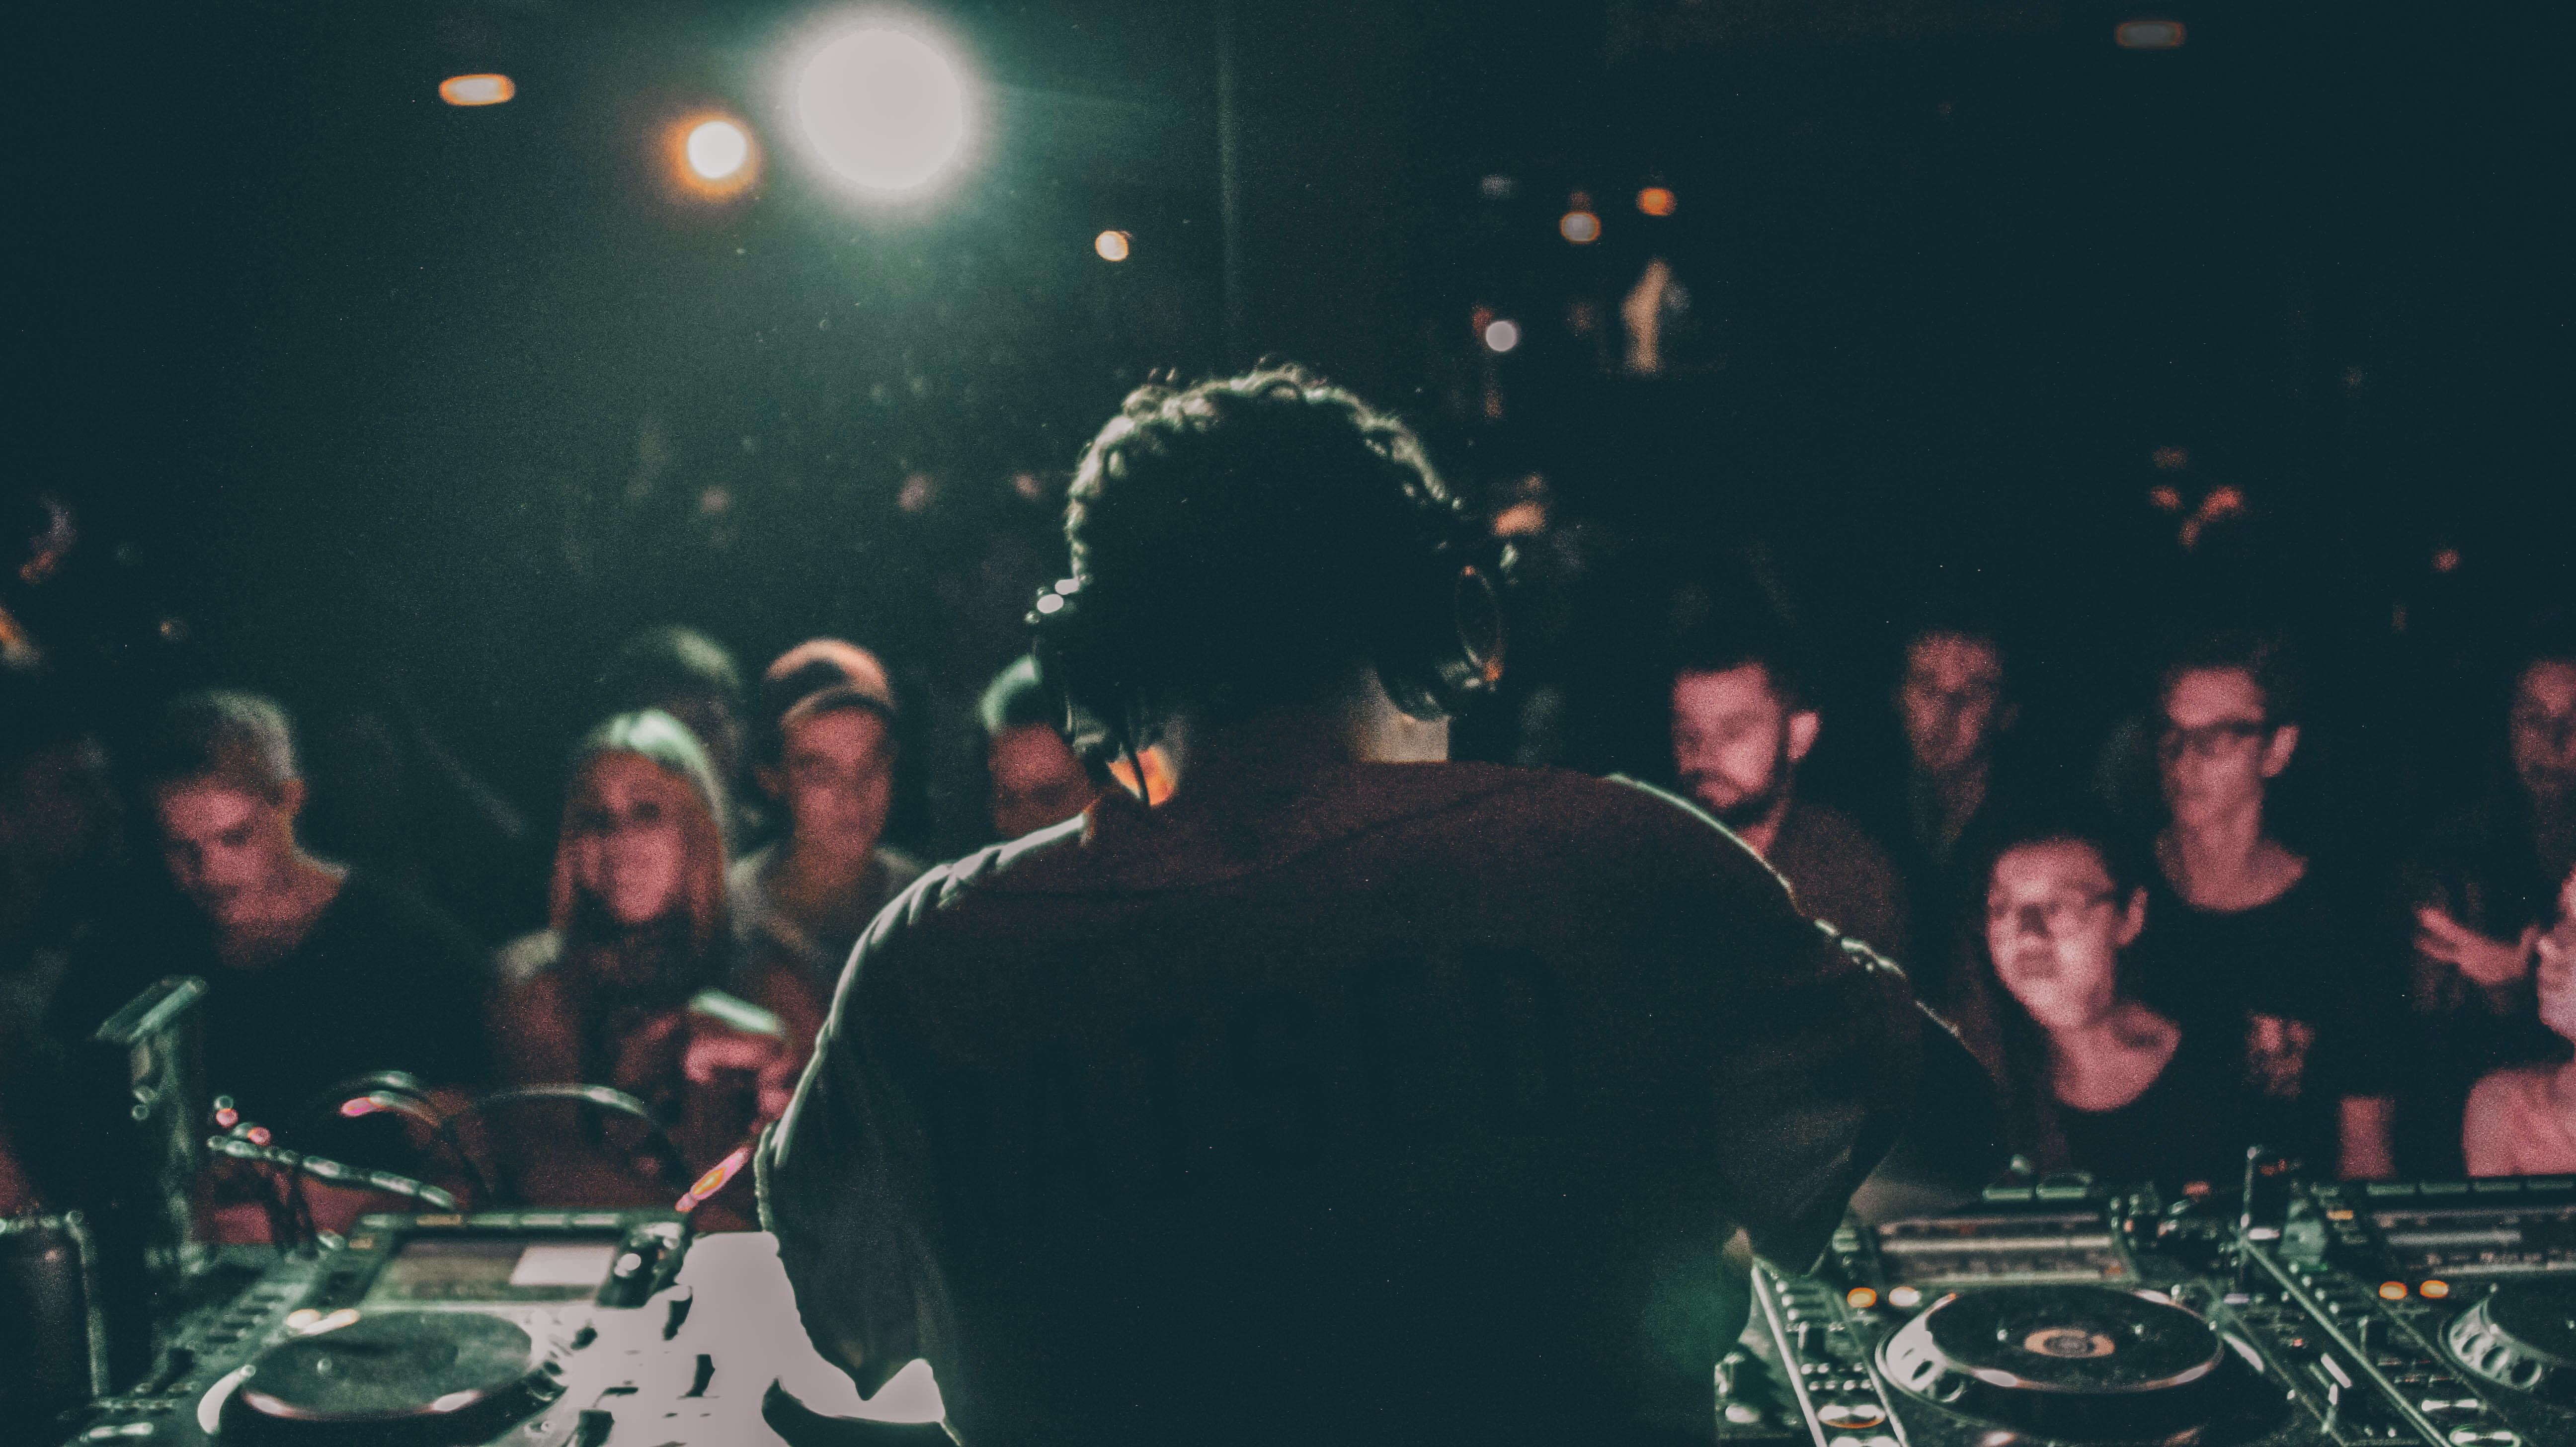 man in grey shirt operating black DJ turntable inside room